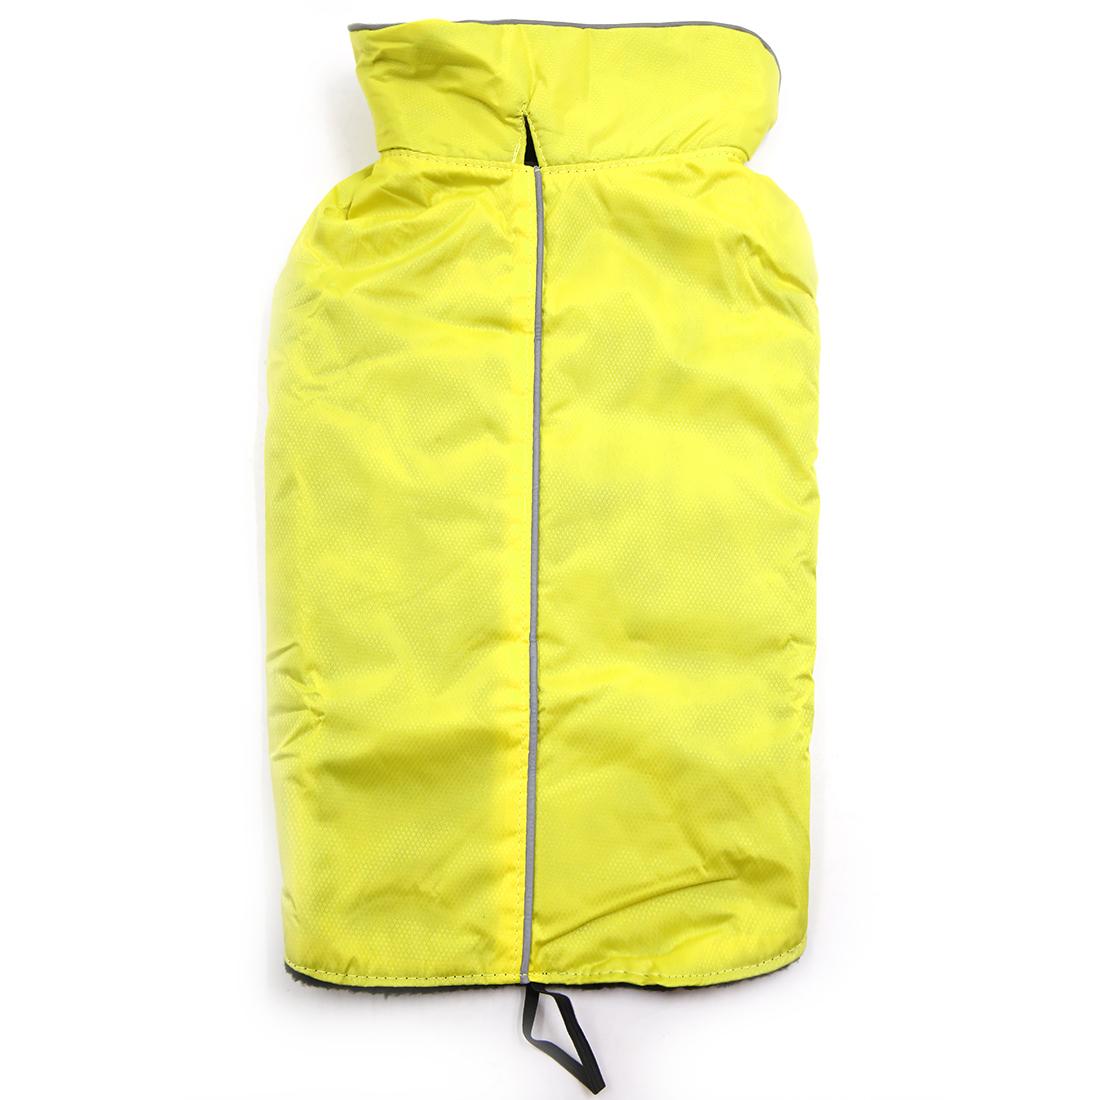 Reflective Waterproof Dog Vest Jacket Clothes Soft Warm Fleece Lining Dog Coat Clothing Yellow XS